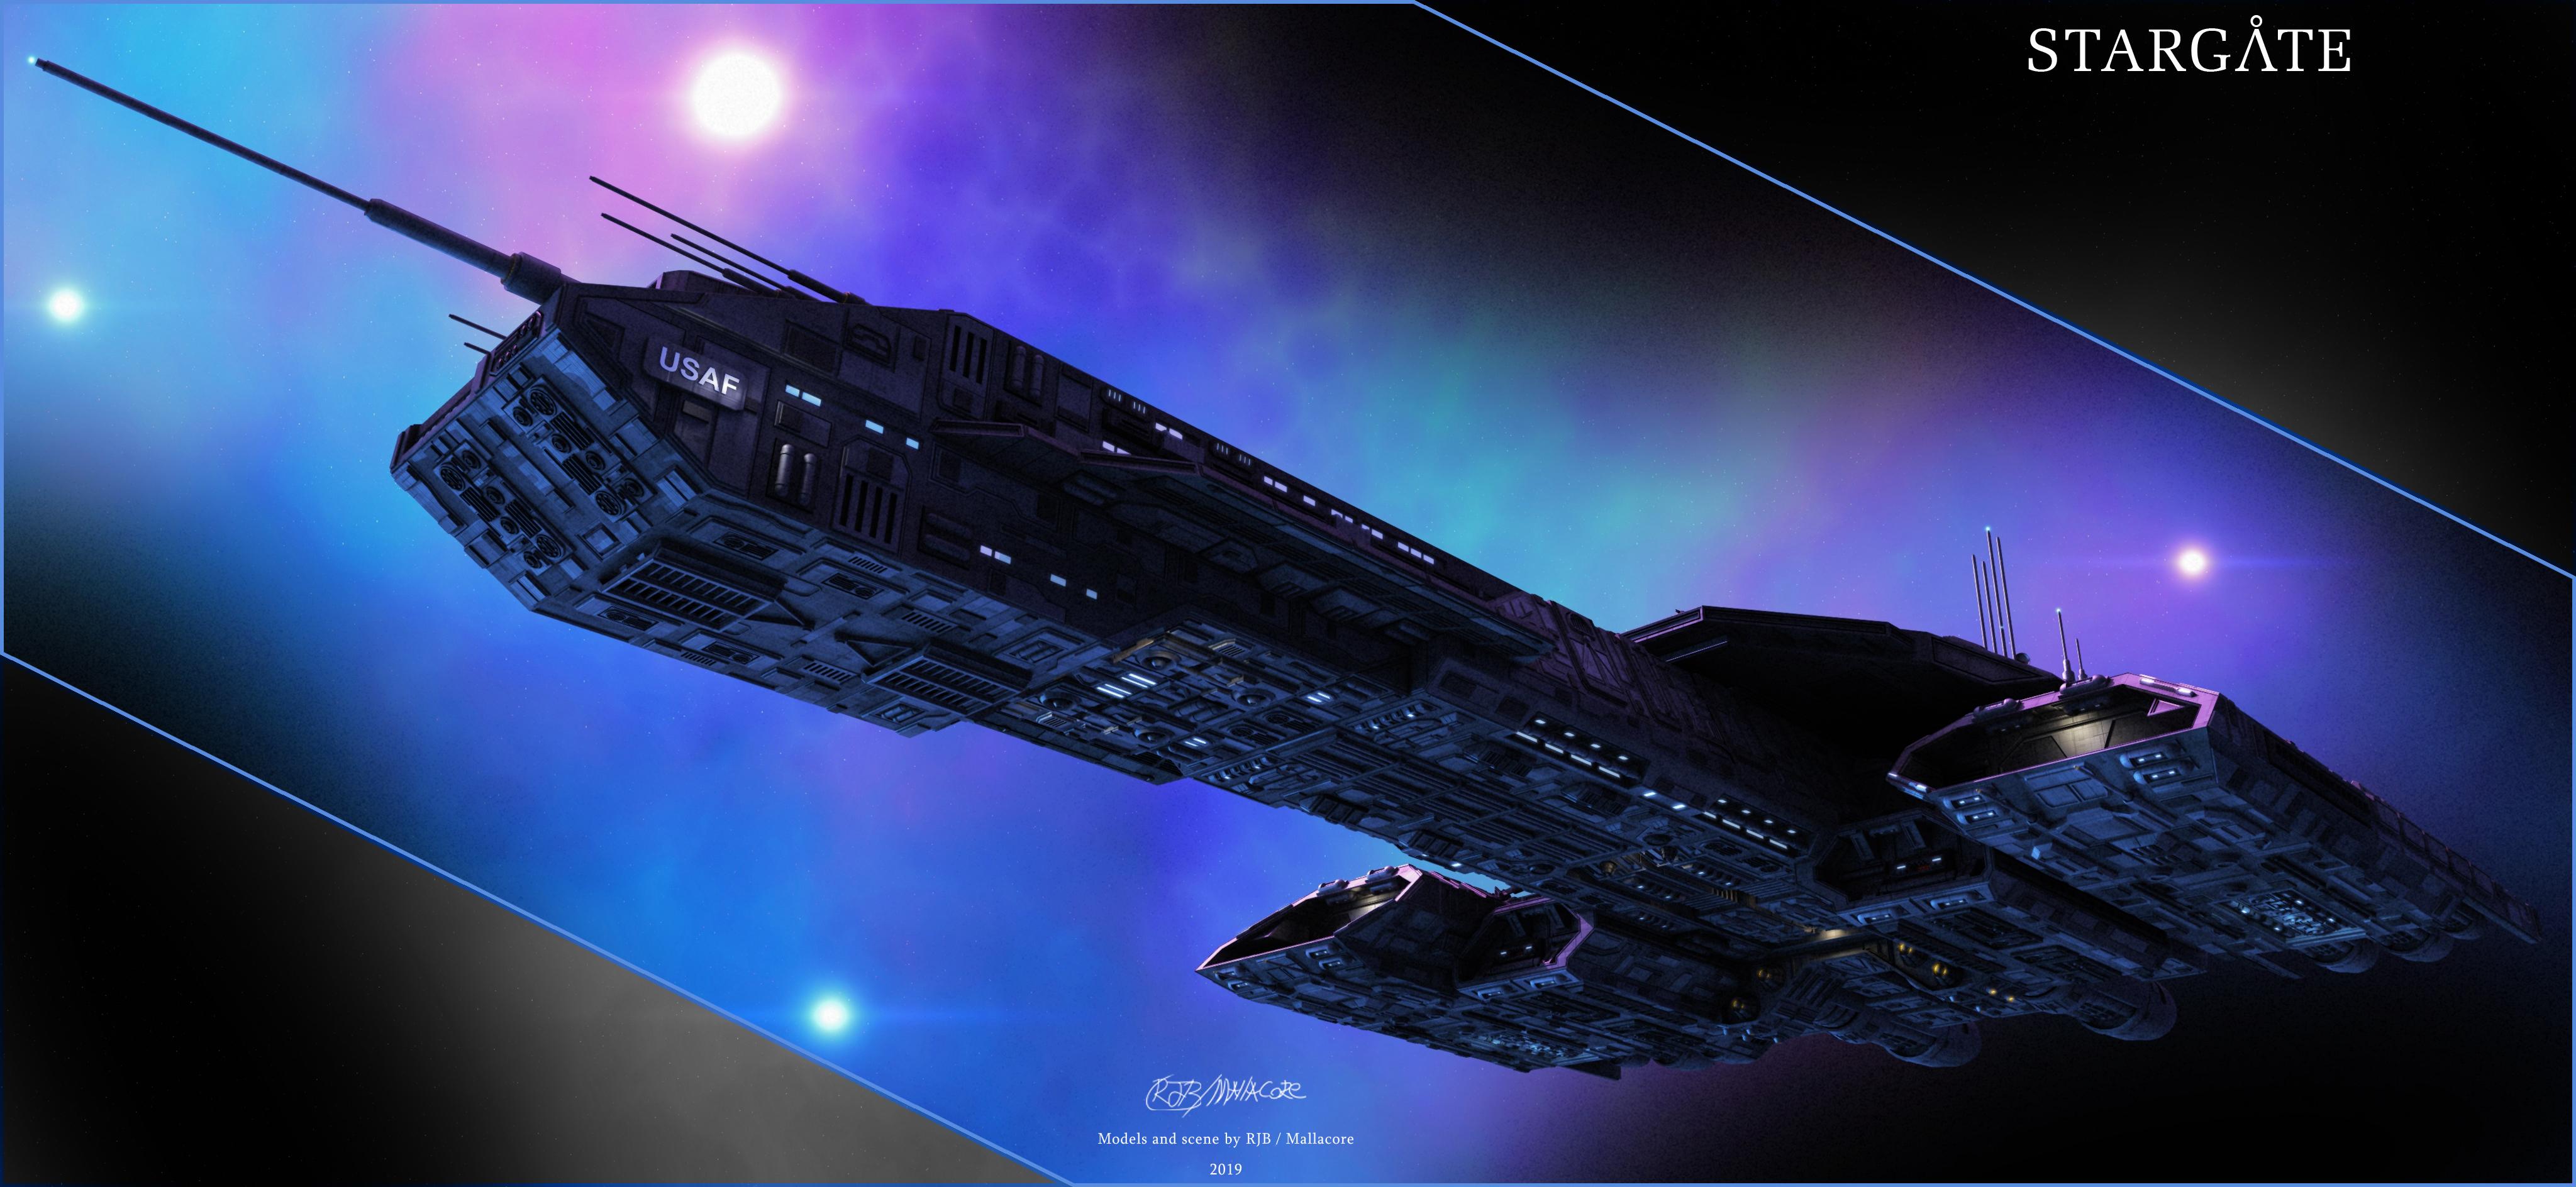 Stargate Daedalus Dec 7 2019 By Mallacore On Deviantart